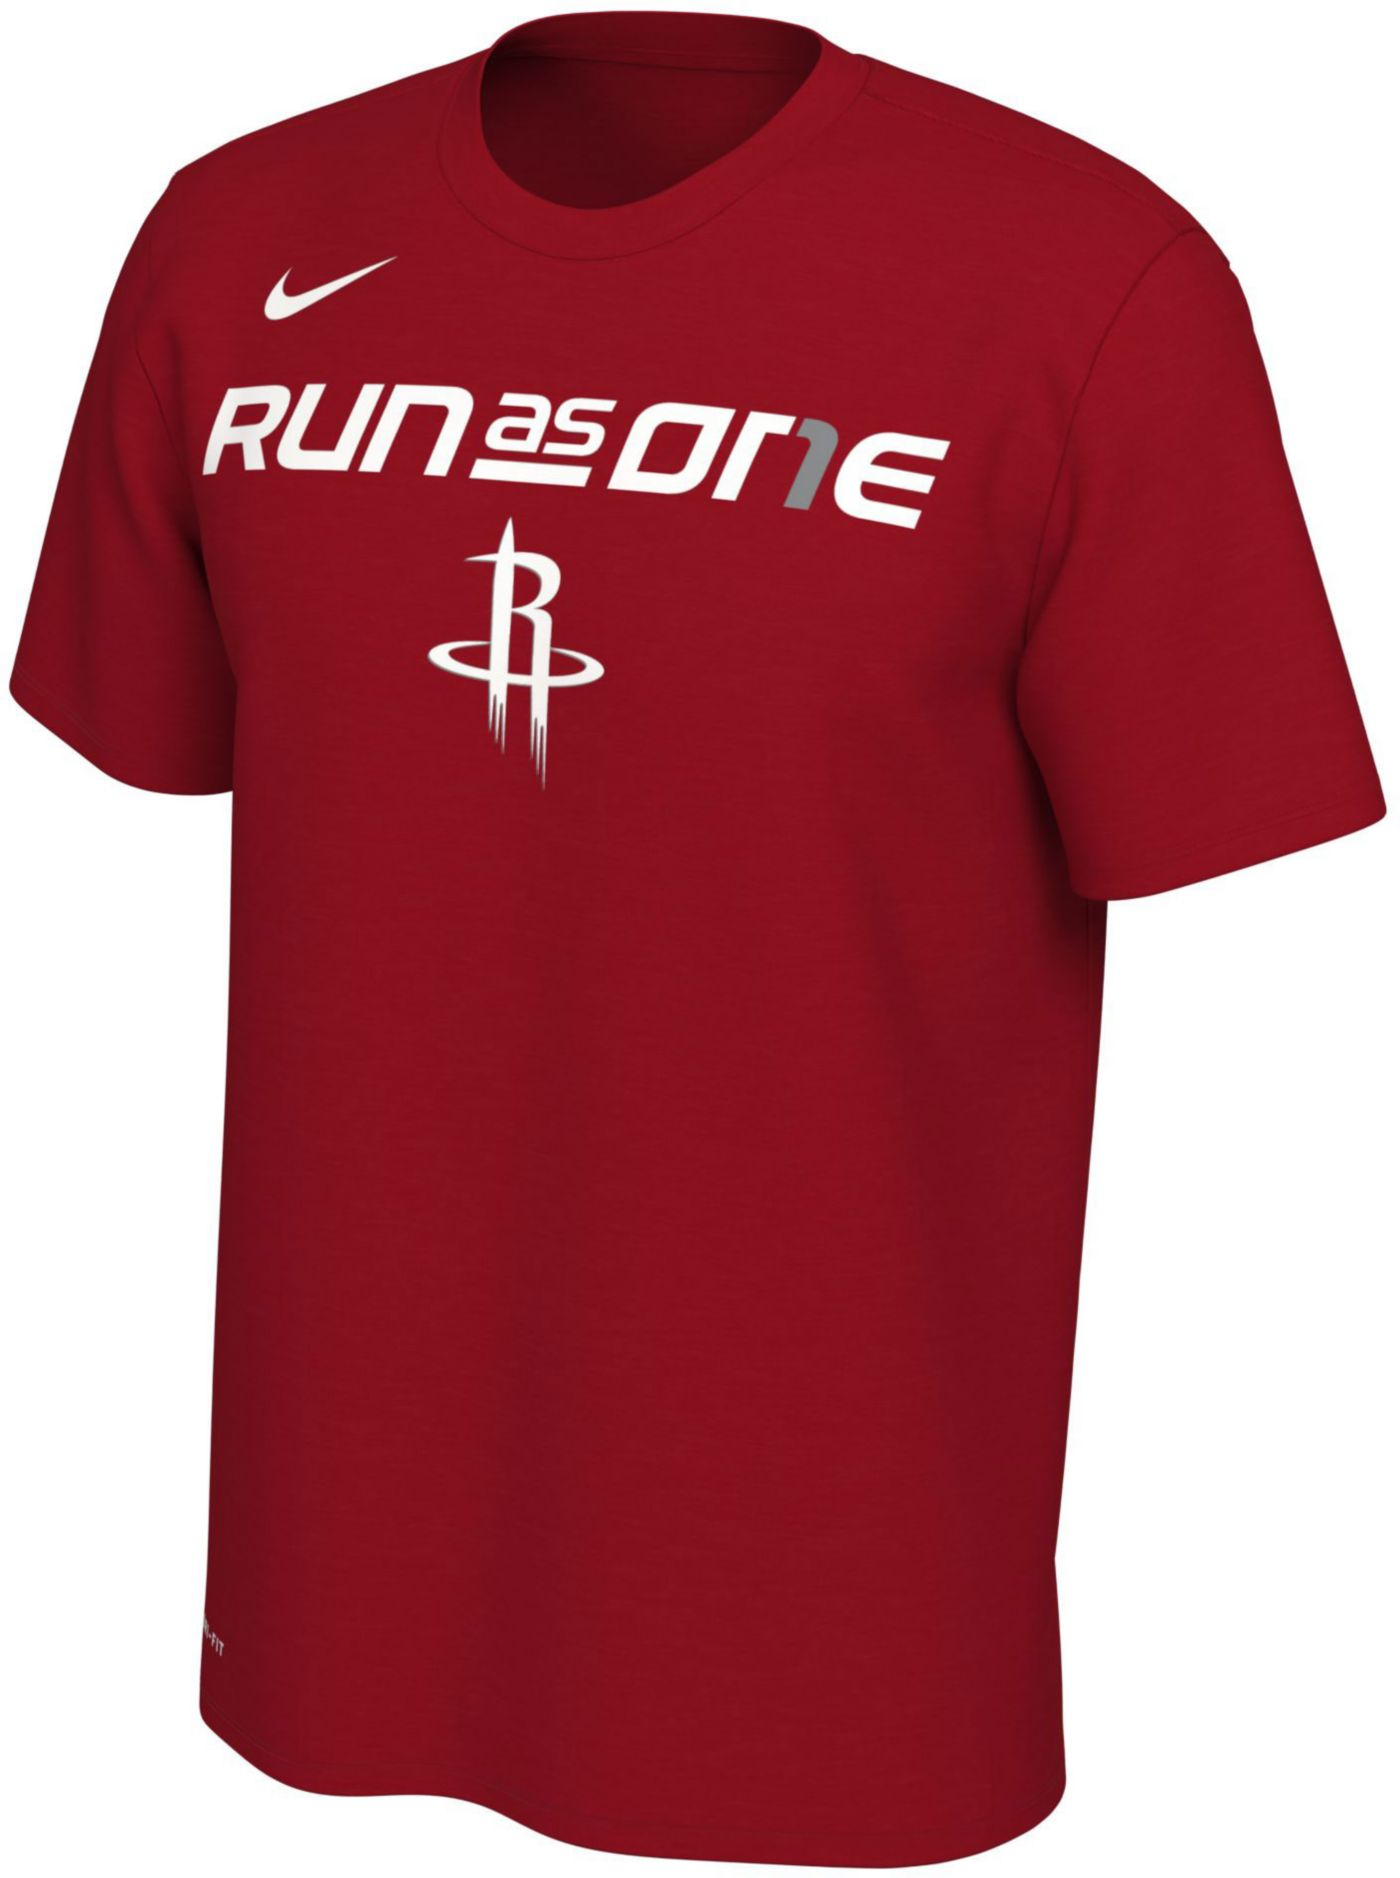 "Nike Youth Houston Rockets 2019 Playoffs ""Run As One"" Dri-FIT T-Shirt"